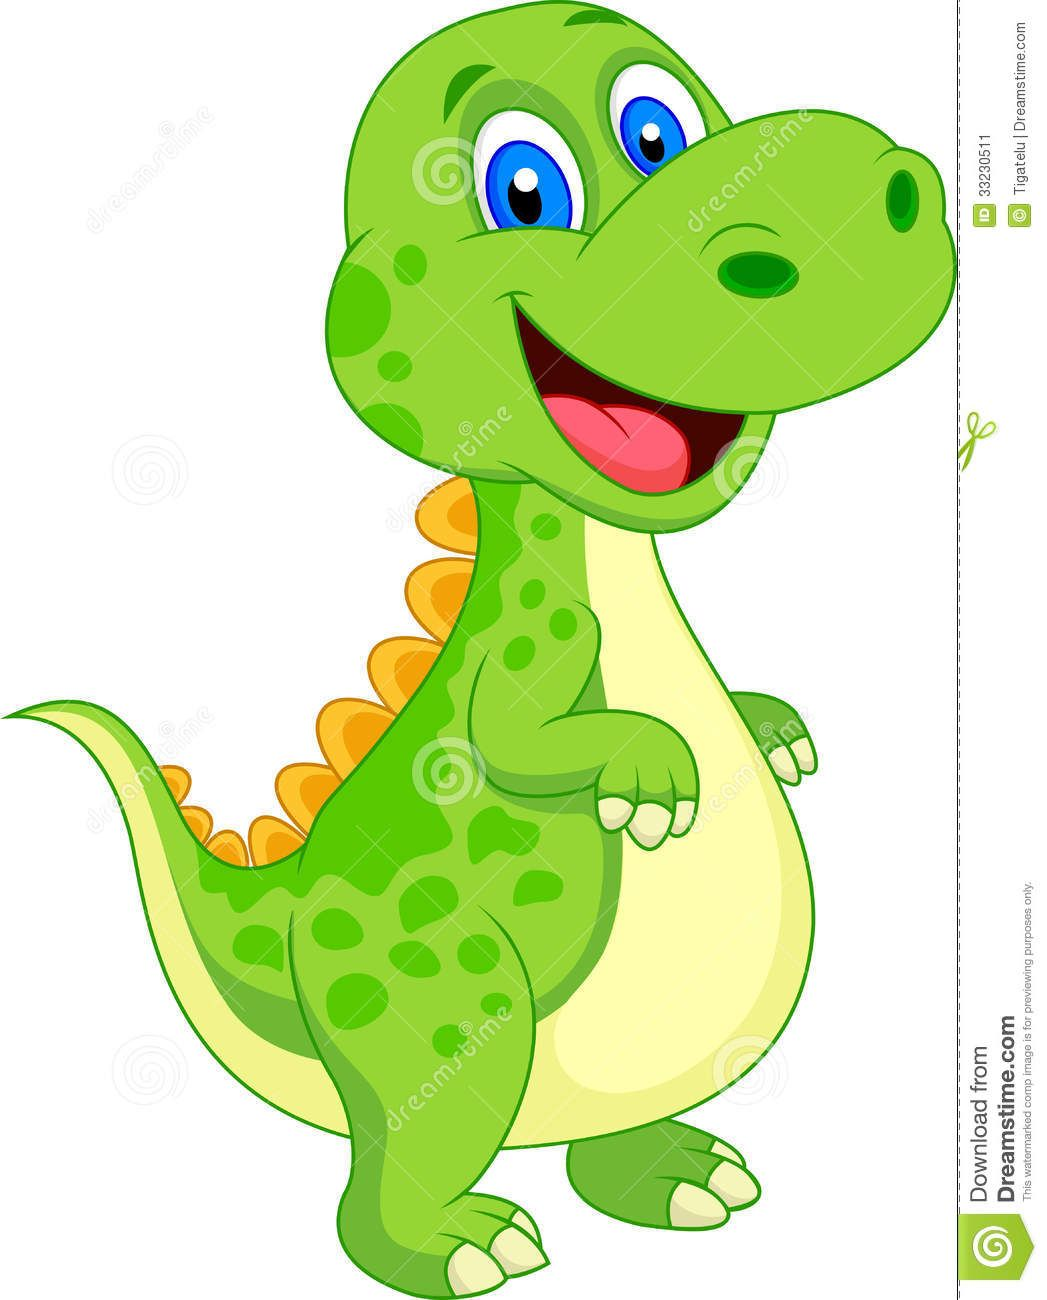 Cute Dinosaur Cartoon Imagenes De Dinosaurios Infantiles Imagenes De Dinosaurios Animados Dinosaurios Animados